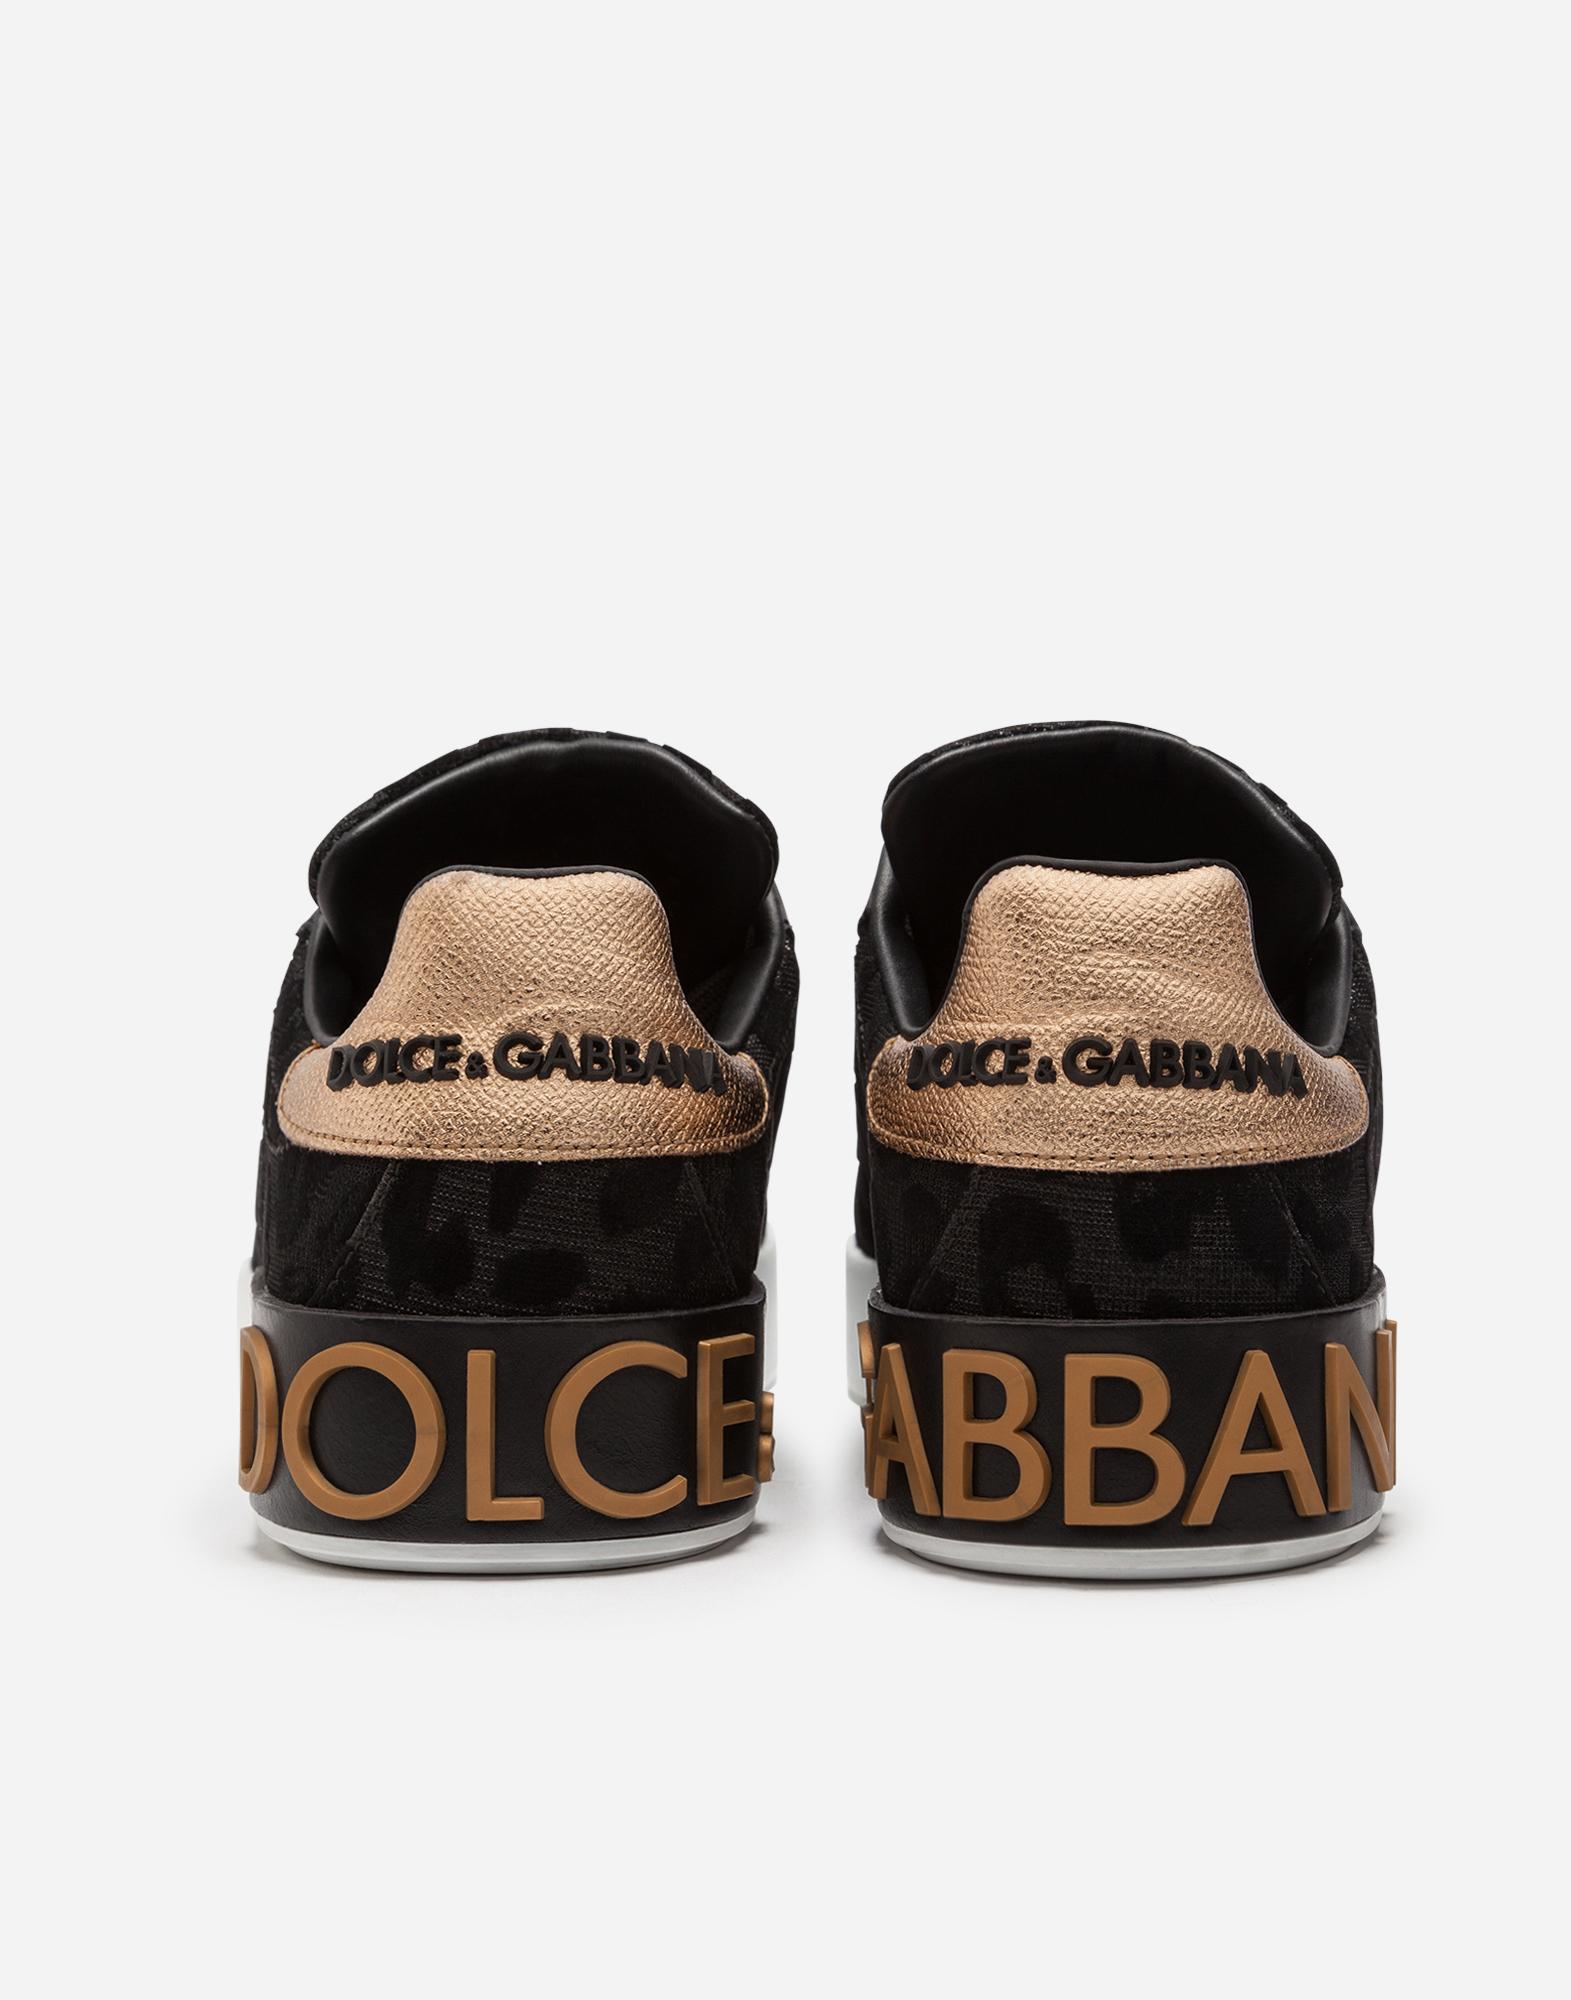 Dolce&Gabbana PORTOFINO SNEAKERS IN COLOR-CHANGING LEOPARD FABRIC